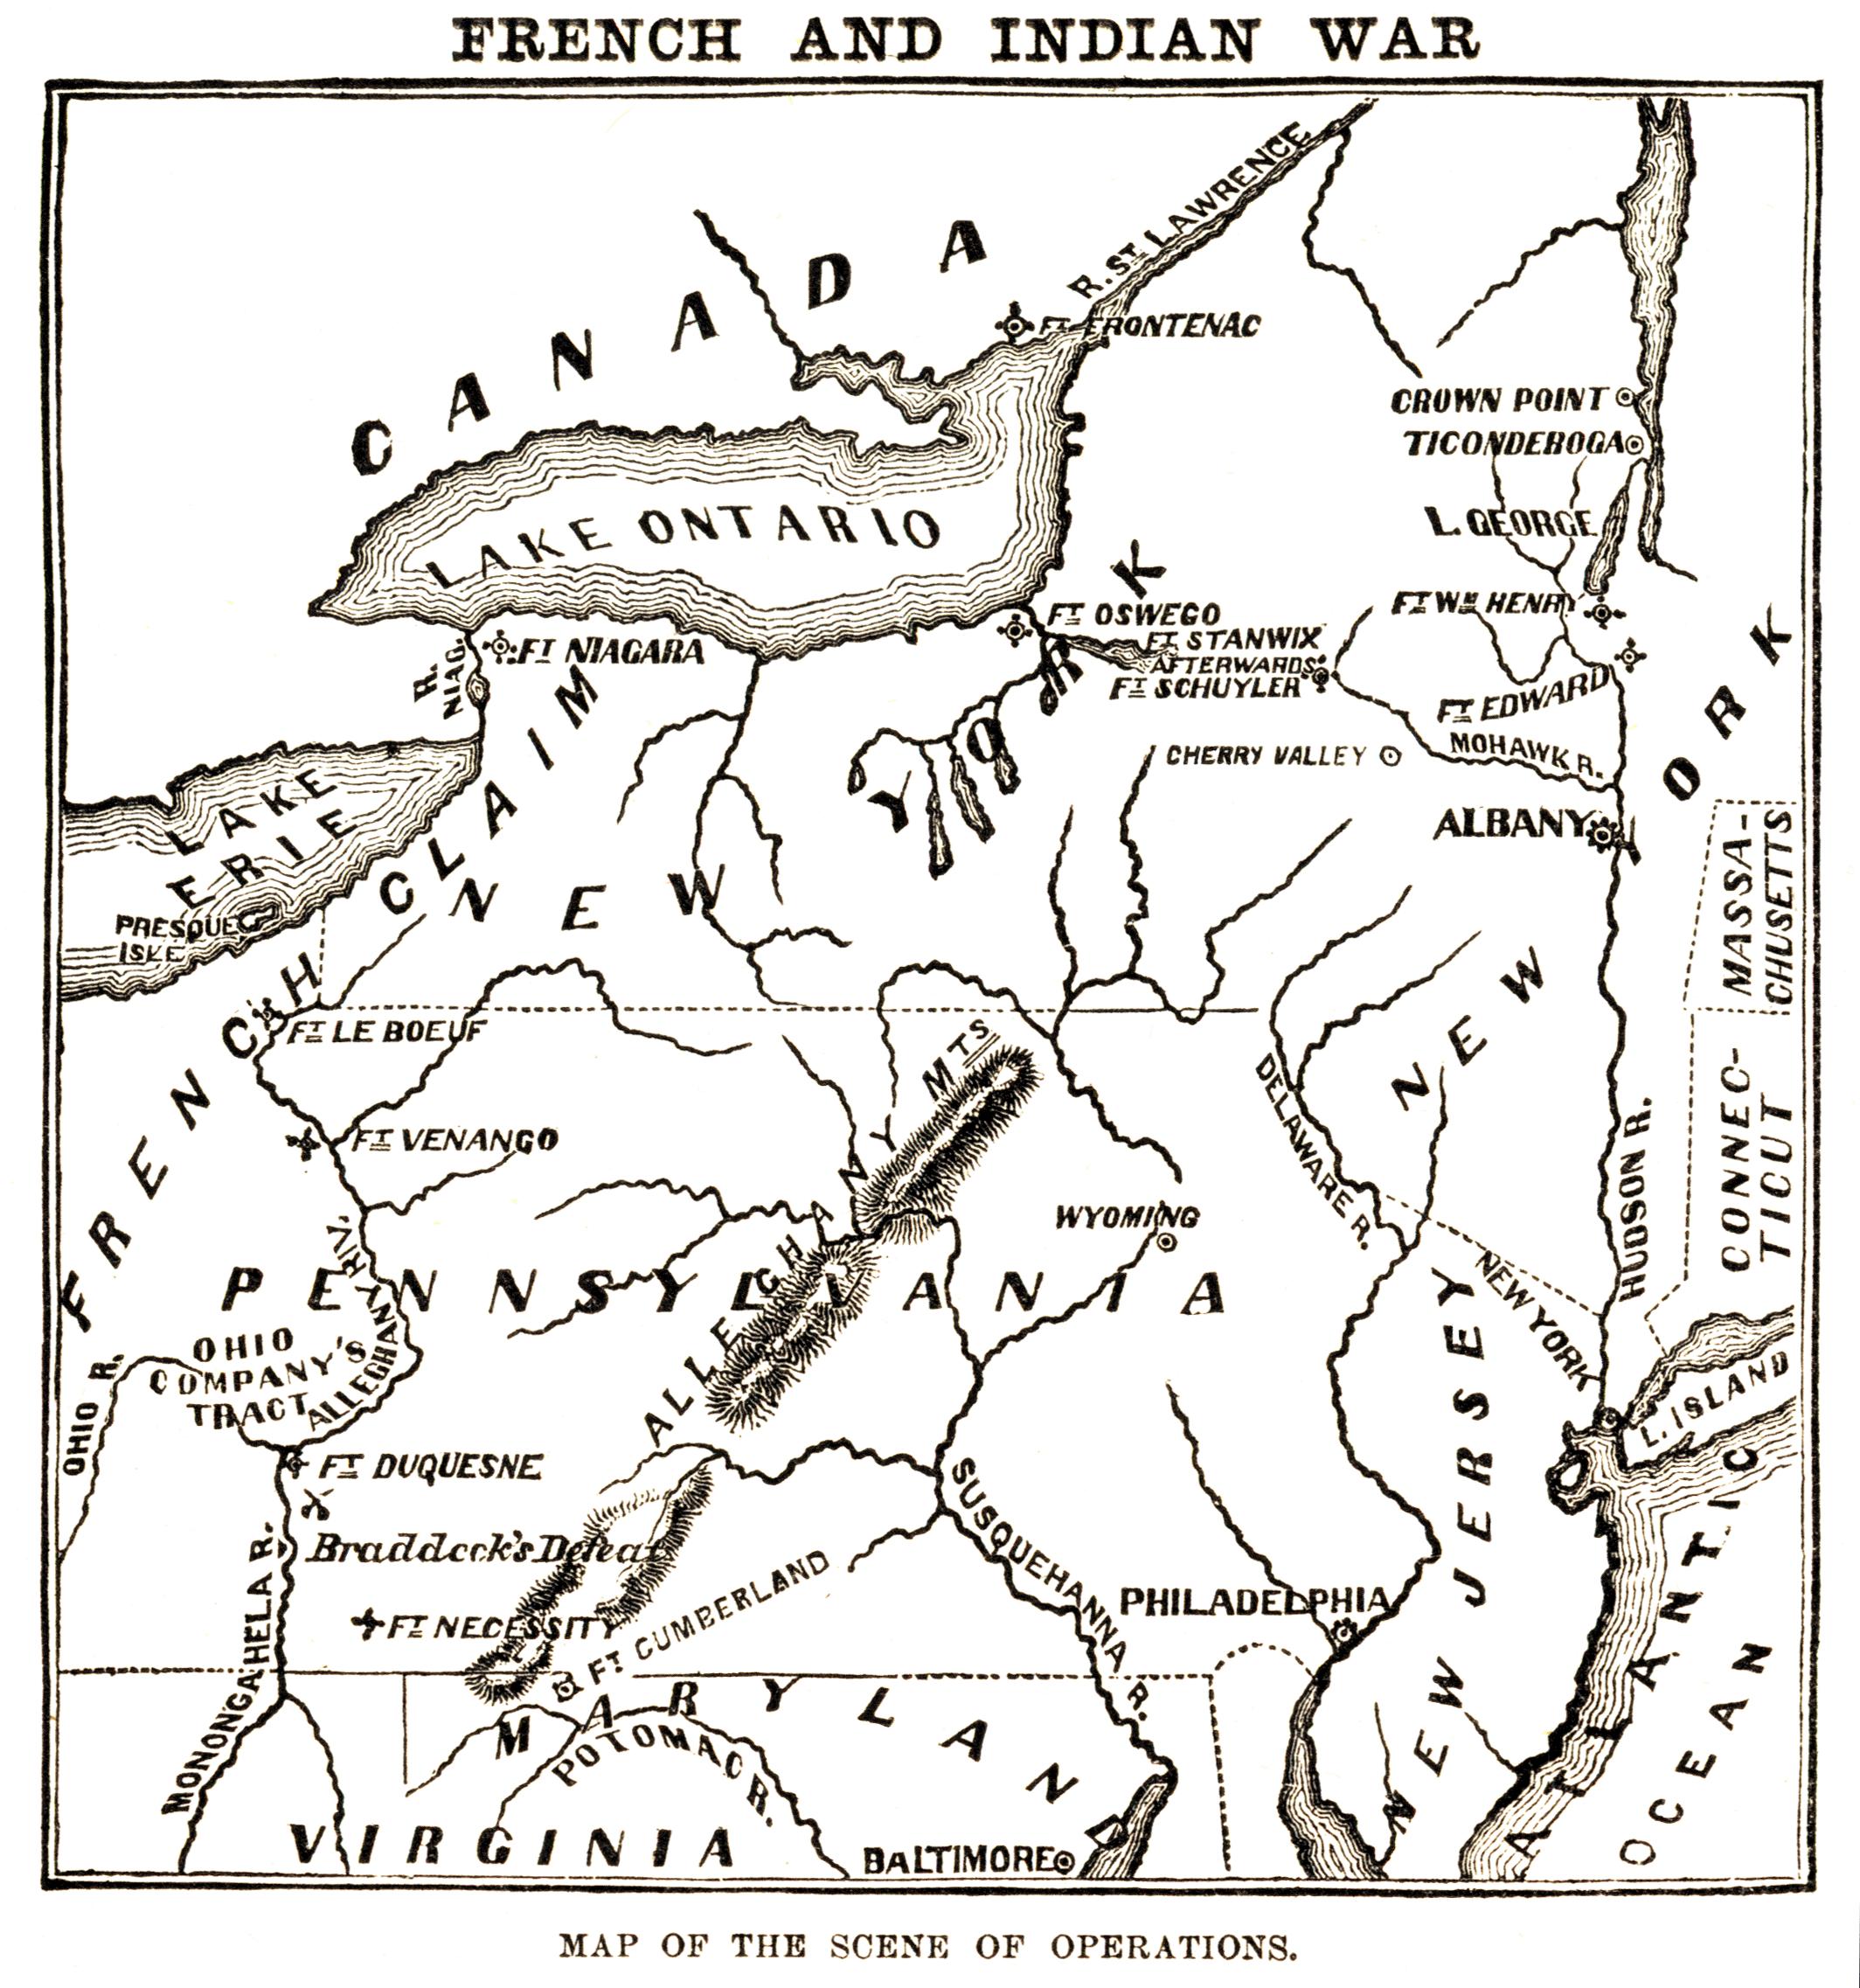 Depiction of Guerra franco-india